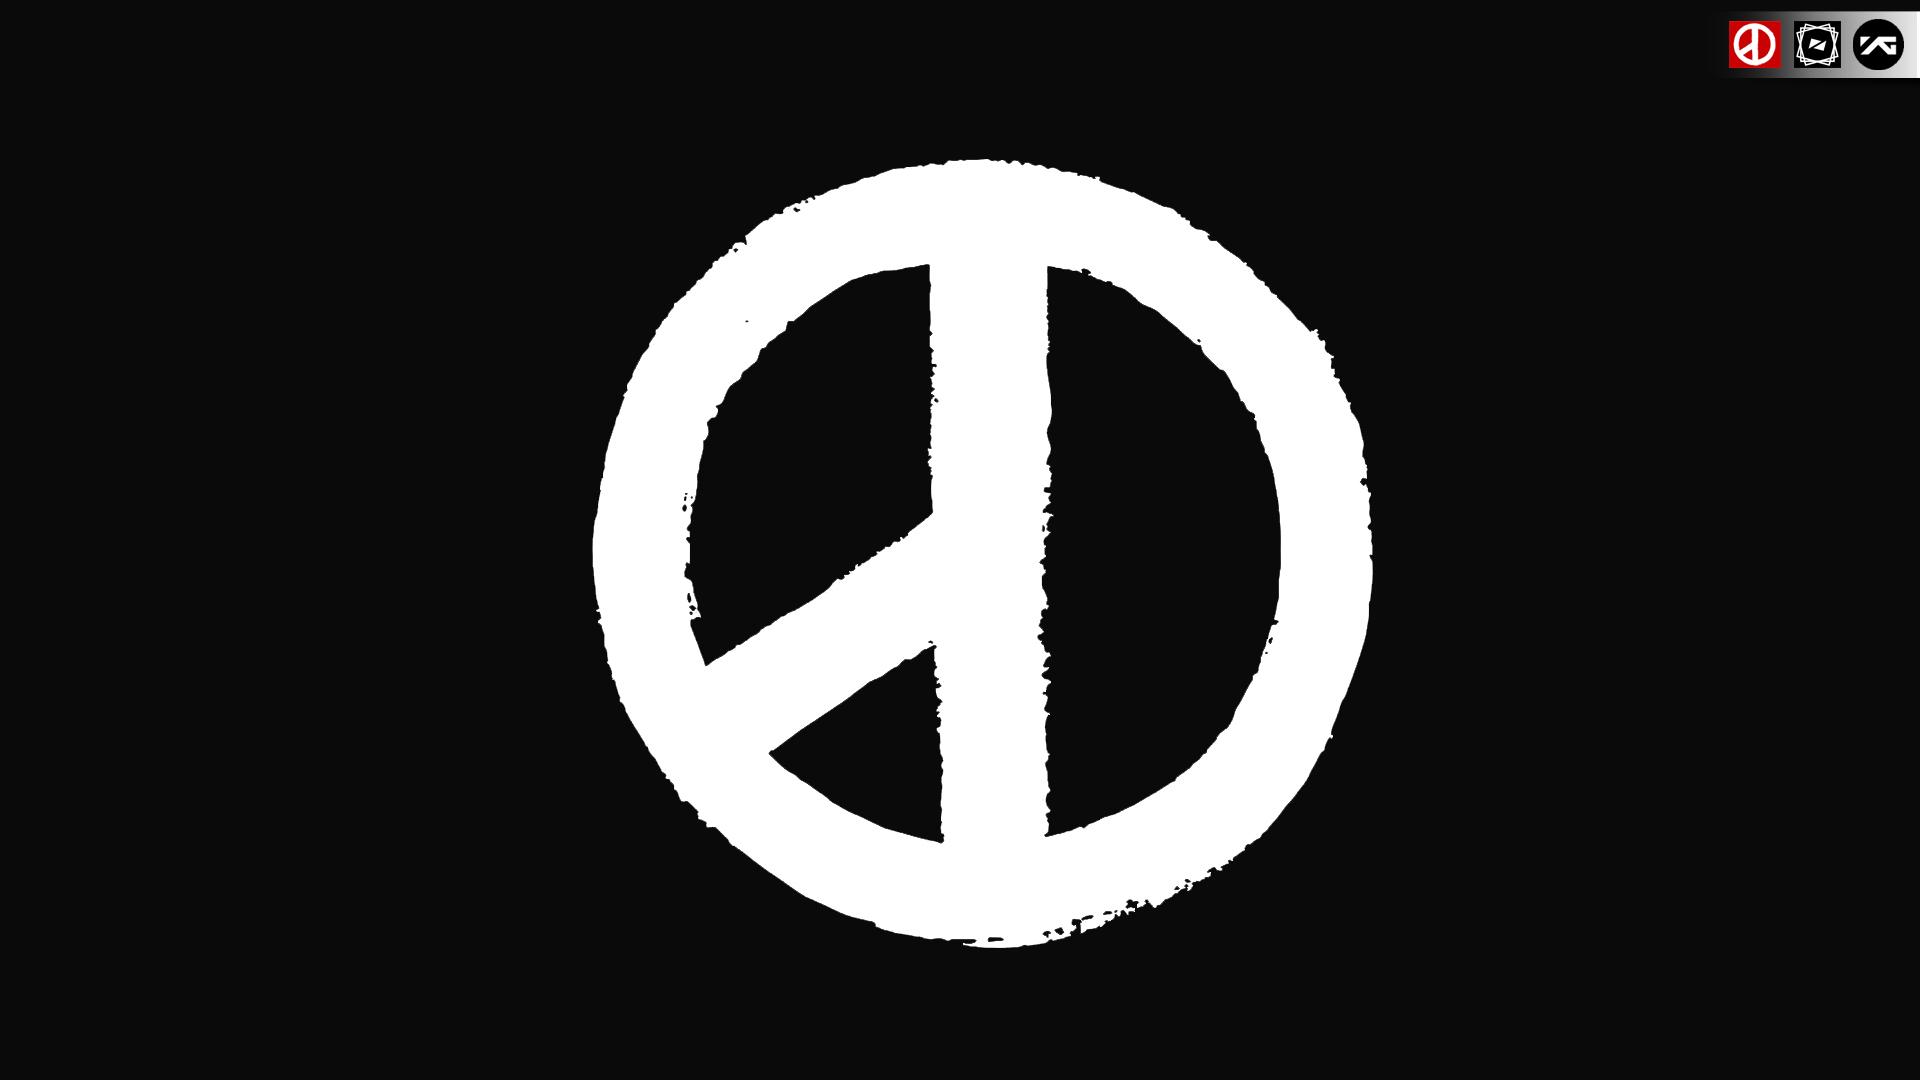 GD Coup D'ETAT Logo GREY 1920x1080 [GRAVETY]